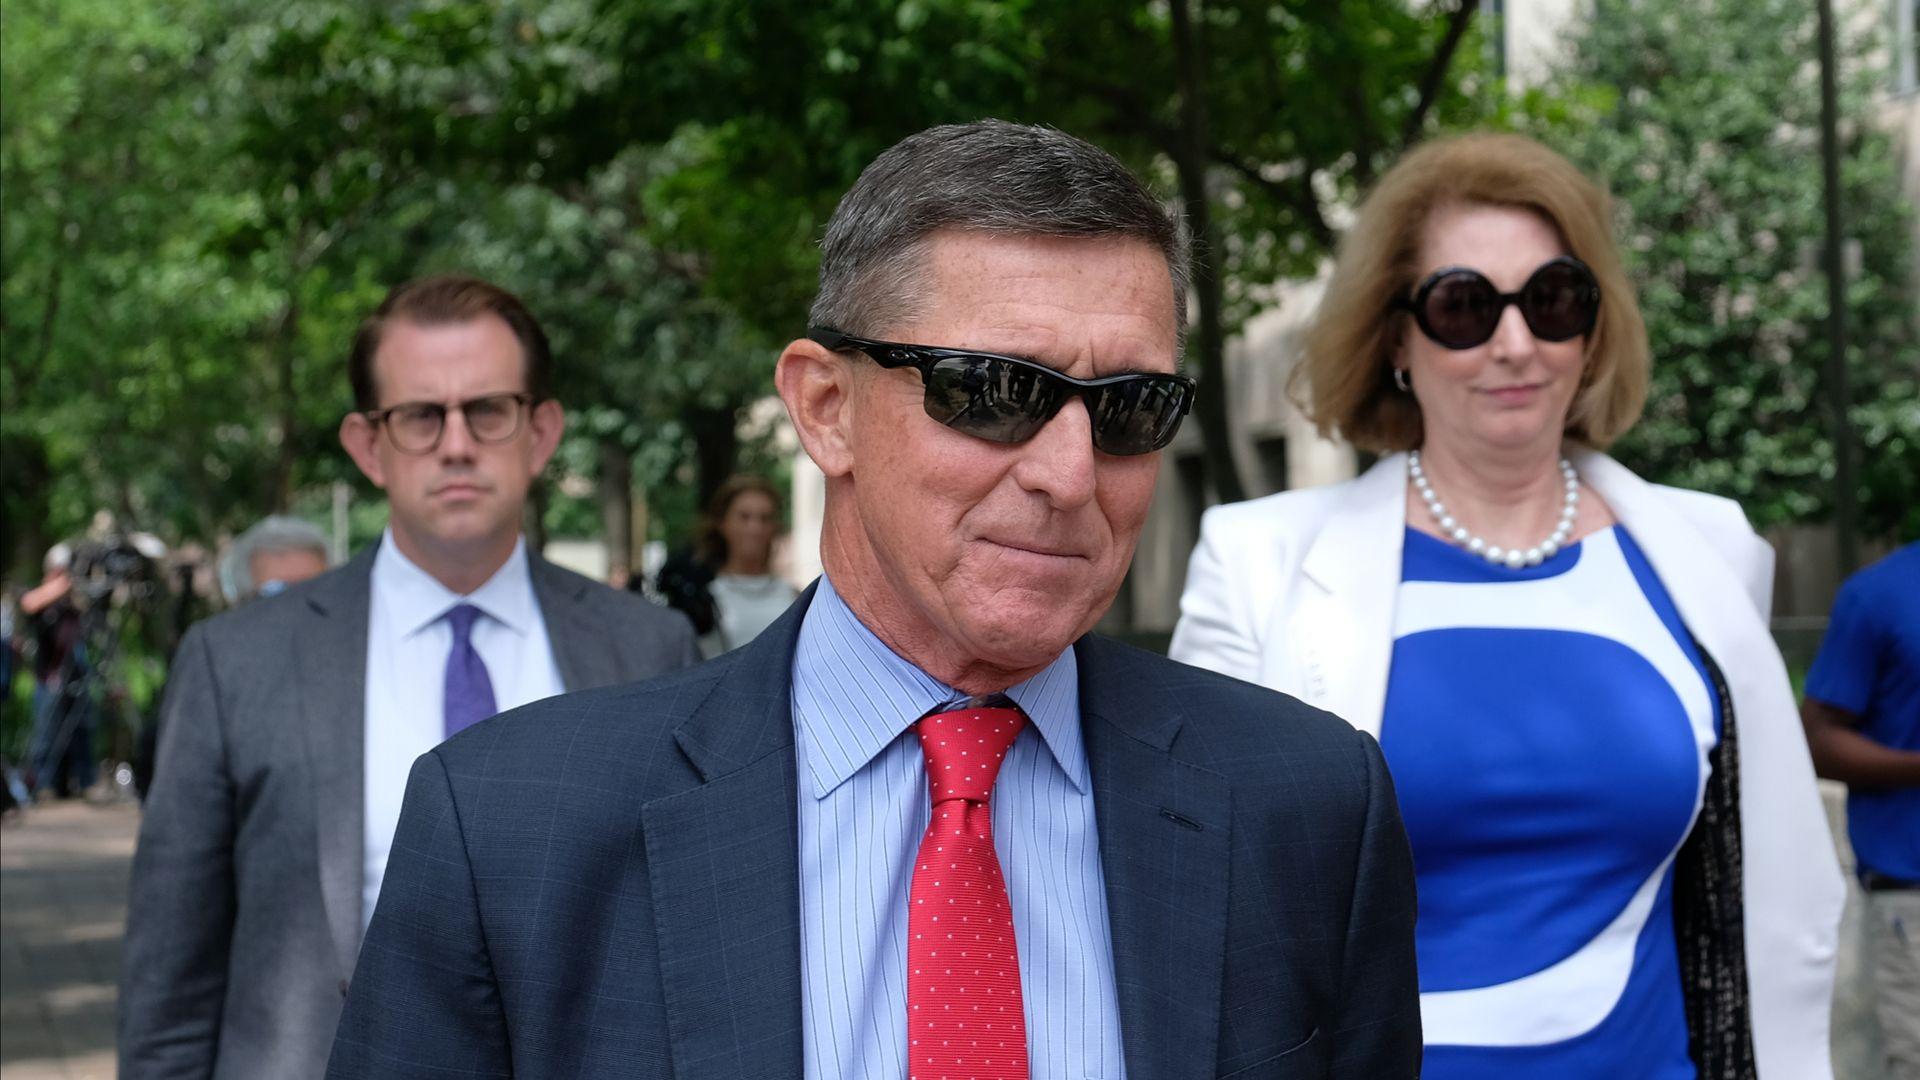 : President Donald Trump's former National Security Adviser Michael Flynn leaves the E. Barrett Prettyman U.S. Courthouse on June 24, 2019 in Washington, DC.